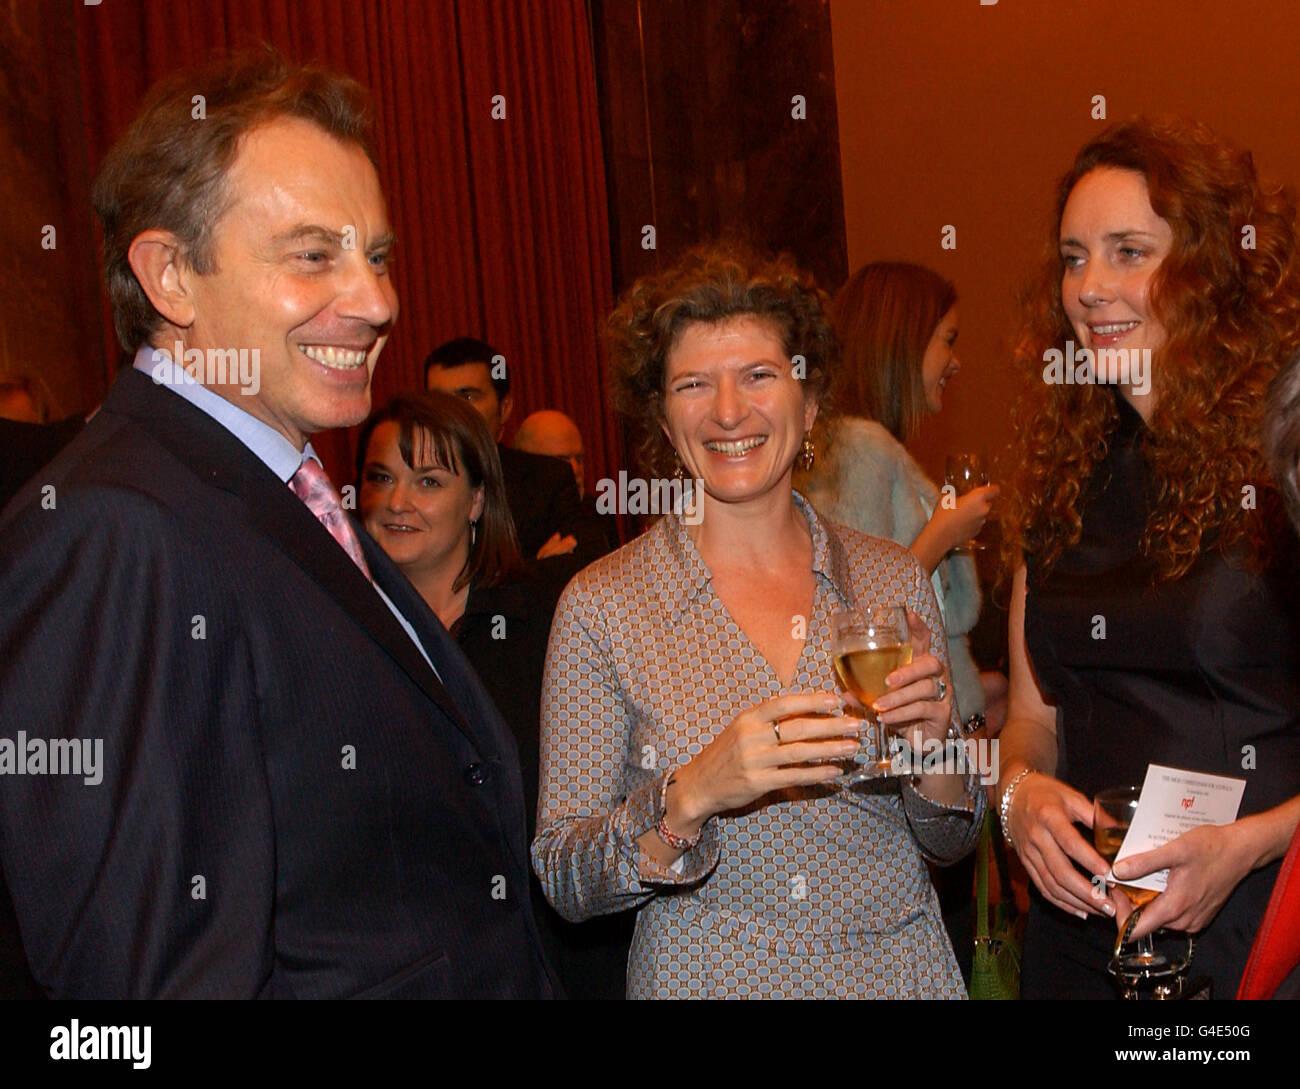 Tony Blair - Newspaper Press Fund 40th Anniversary - Stock Image